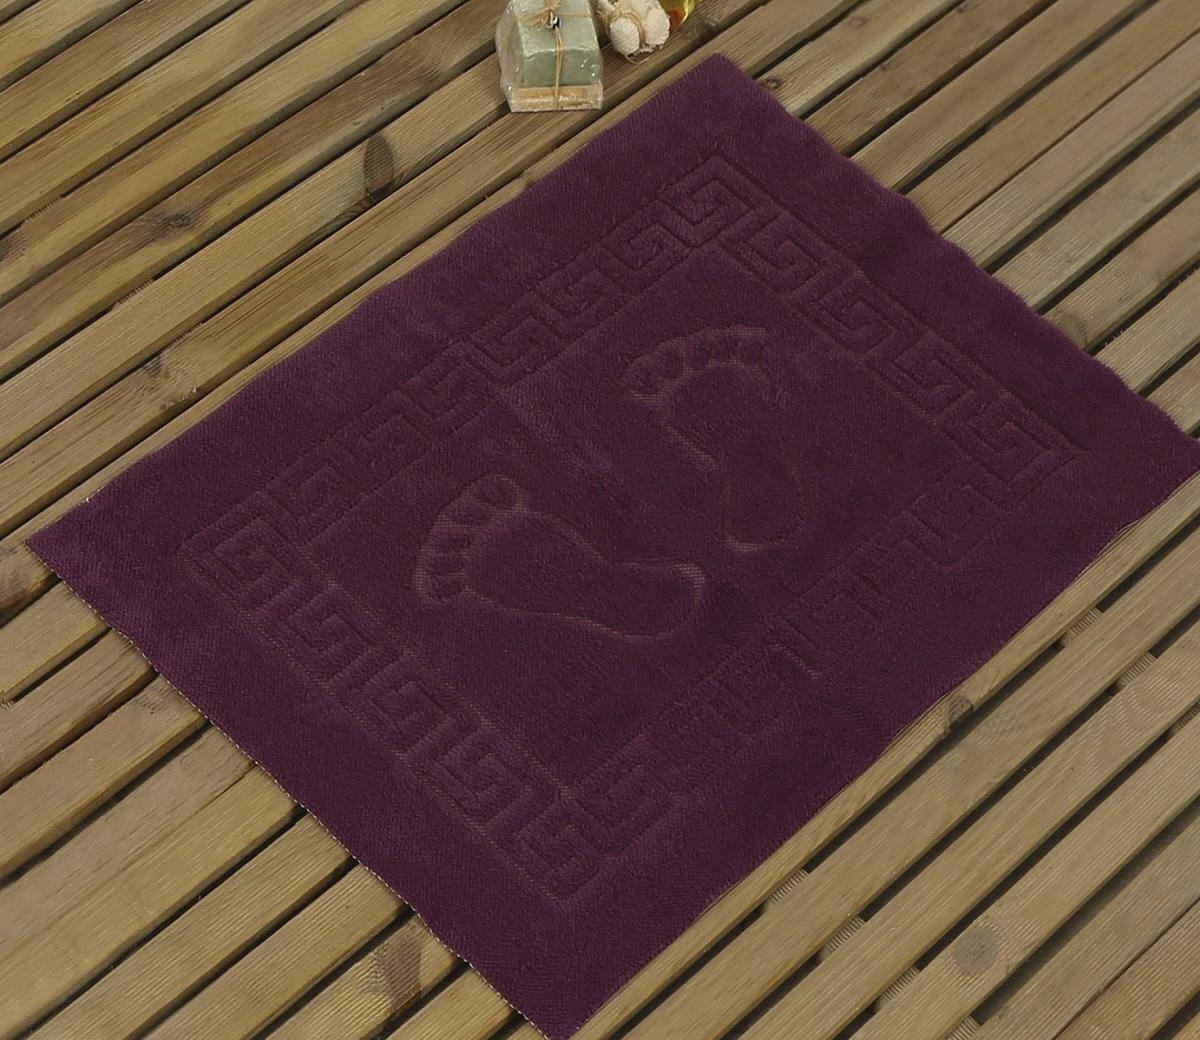 Коврик для ванной Karna Likya , цвет: фиолетовый, 50 х 70 см631/CHAR013